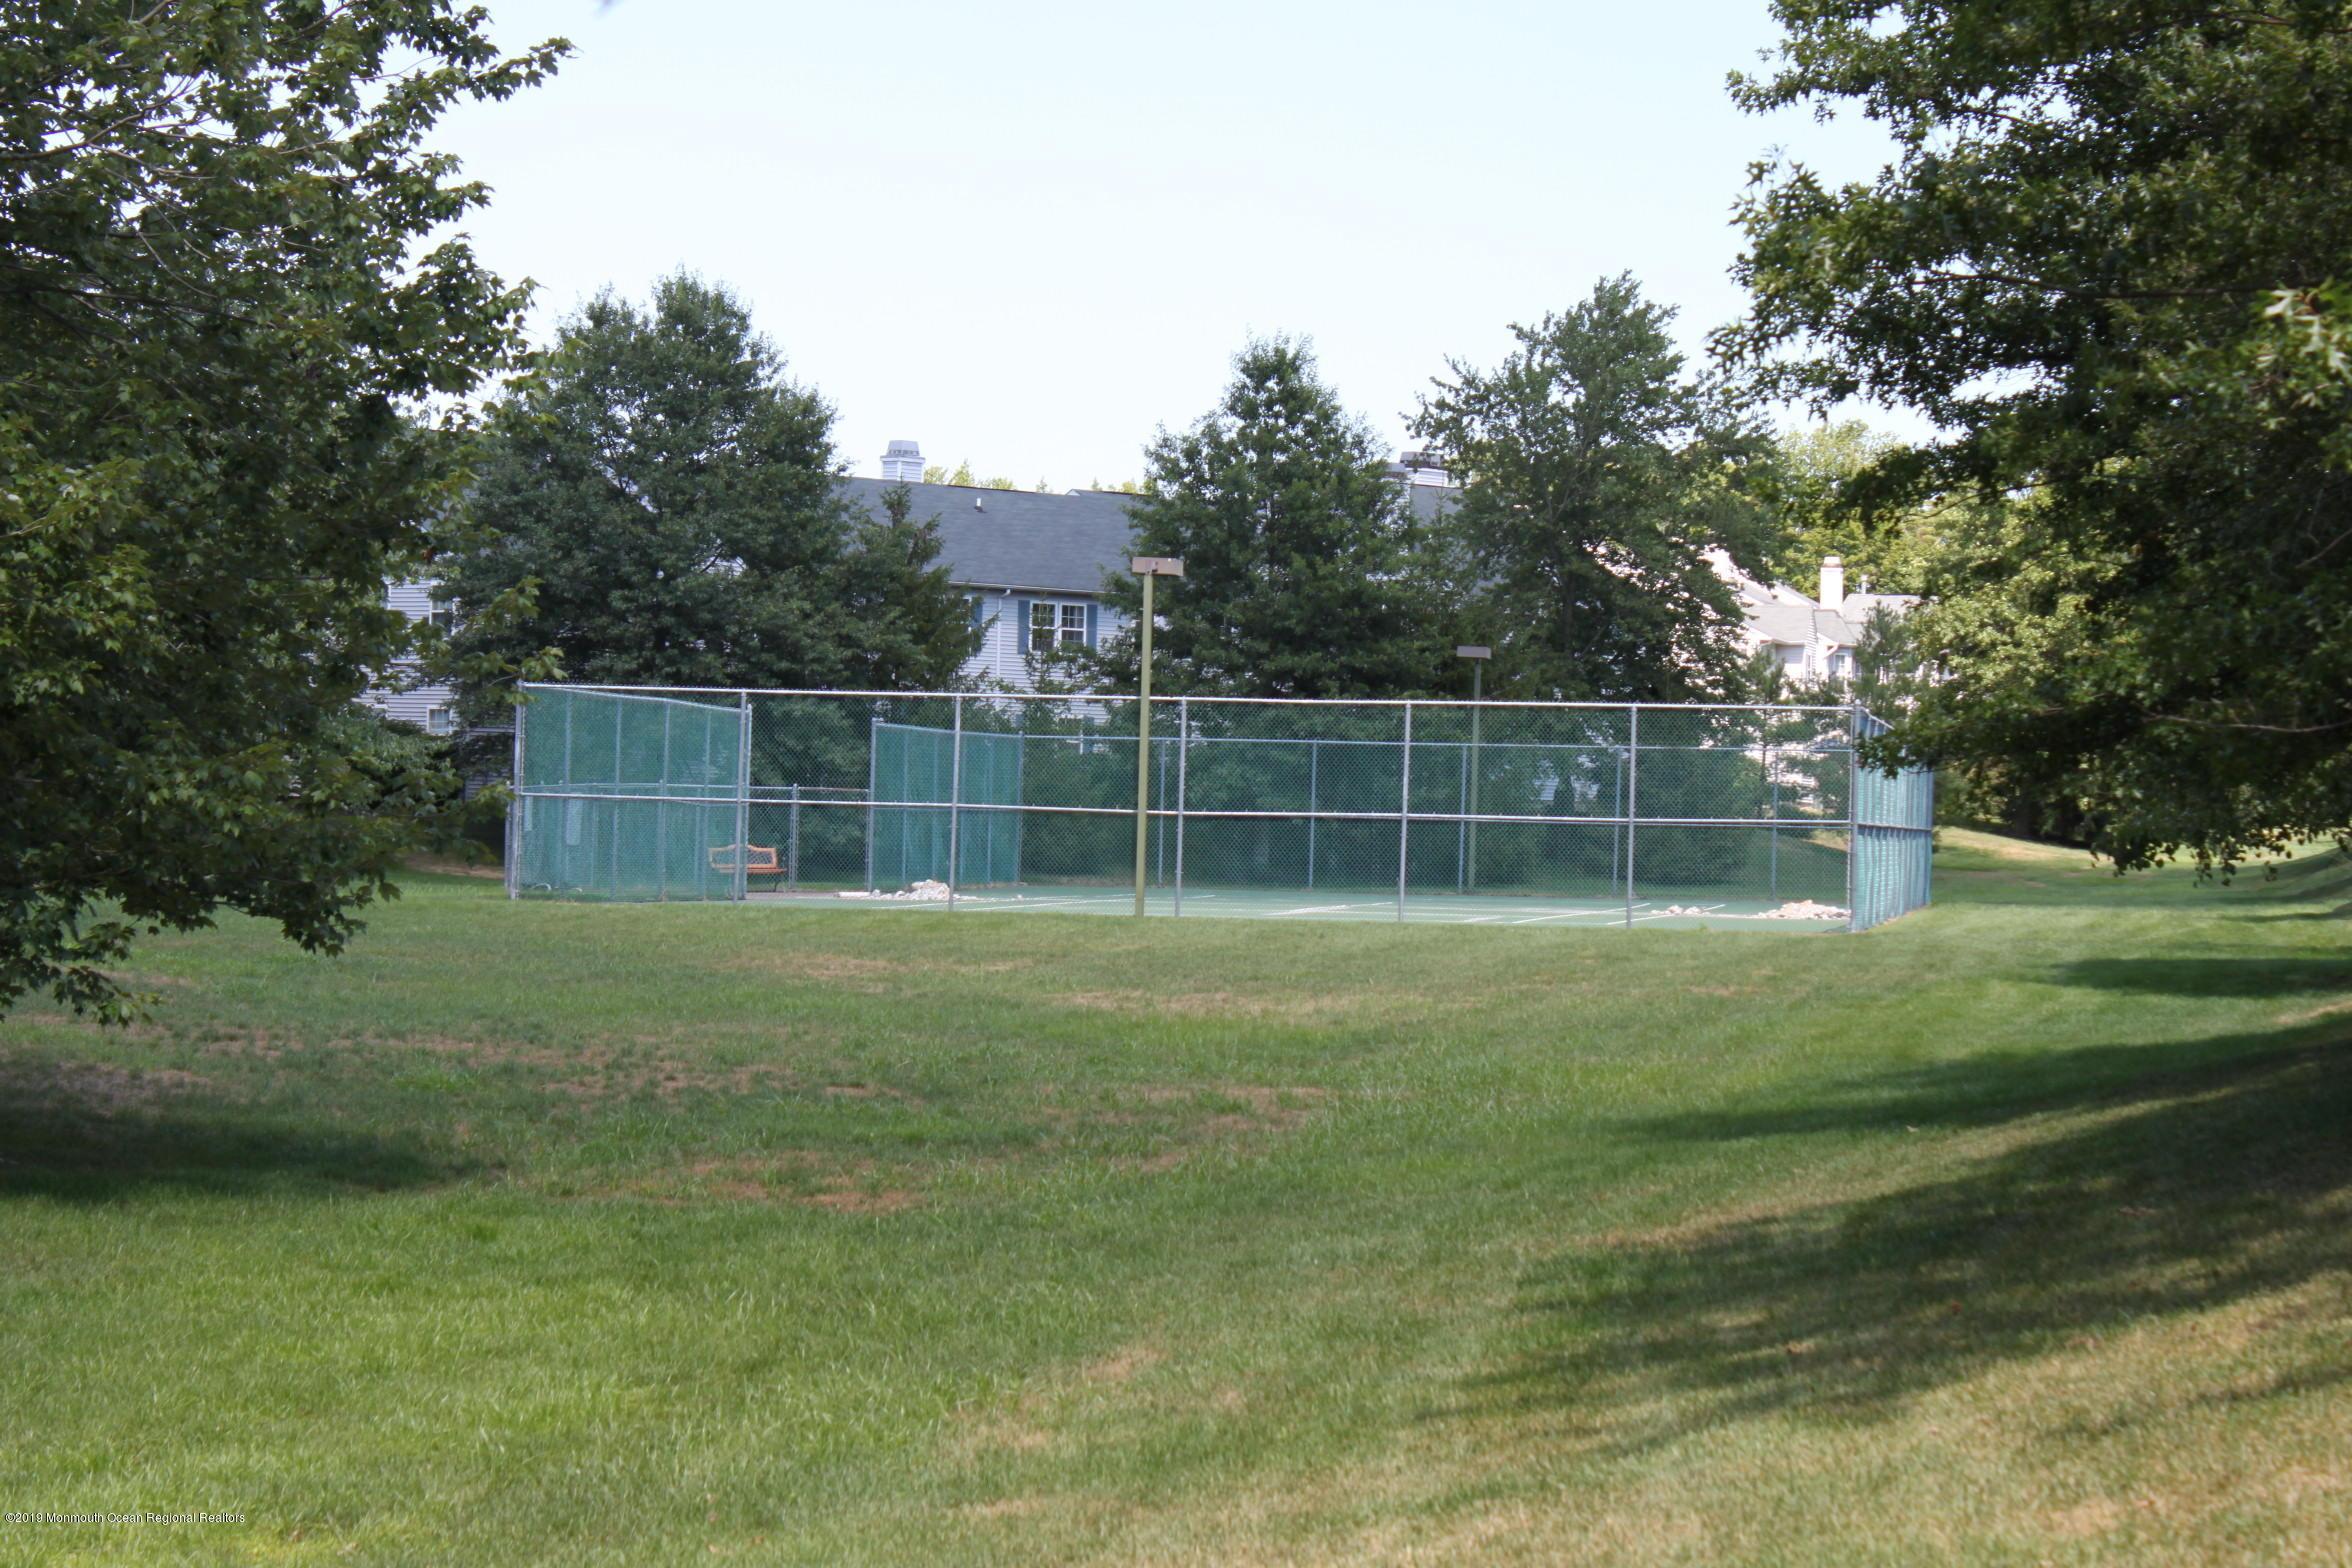 135 Pierce Drive, Ocean Twp, NJ, 07712 - Search Homes & Real